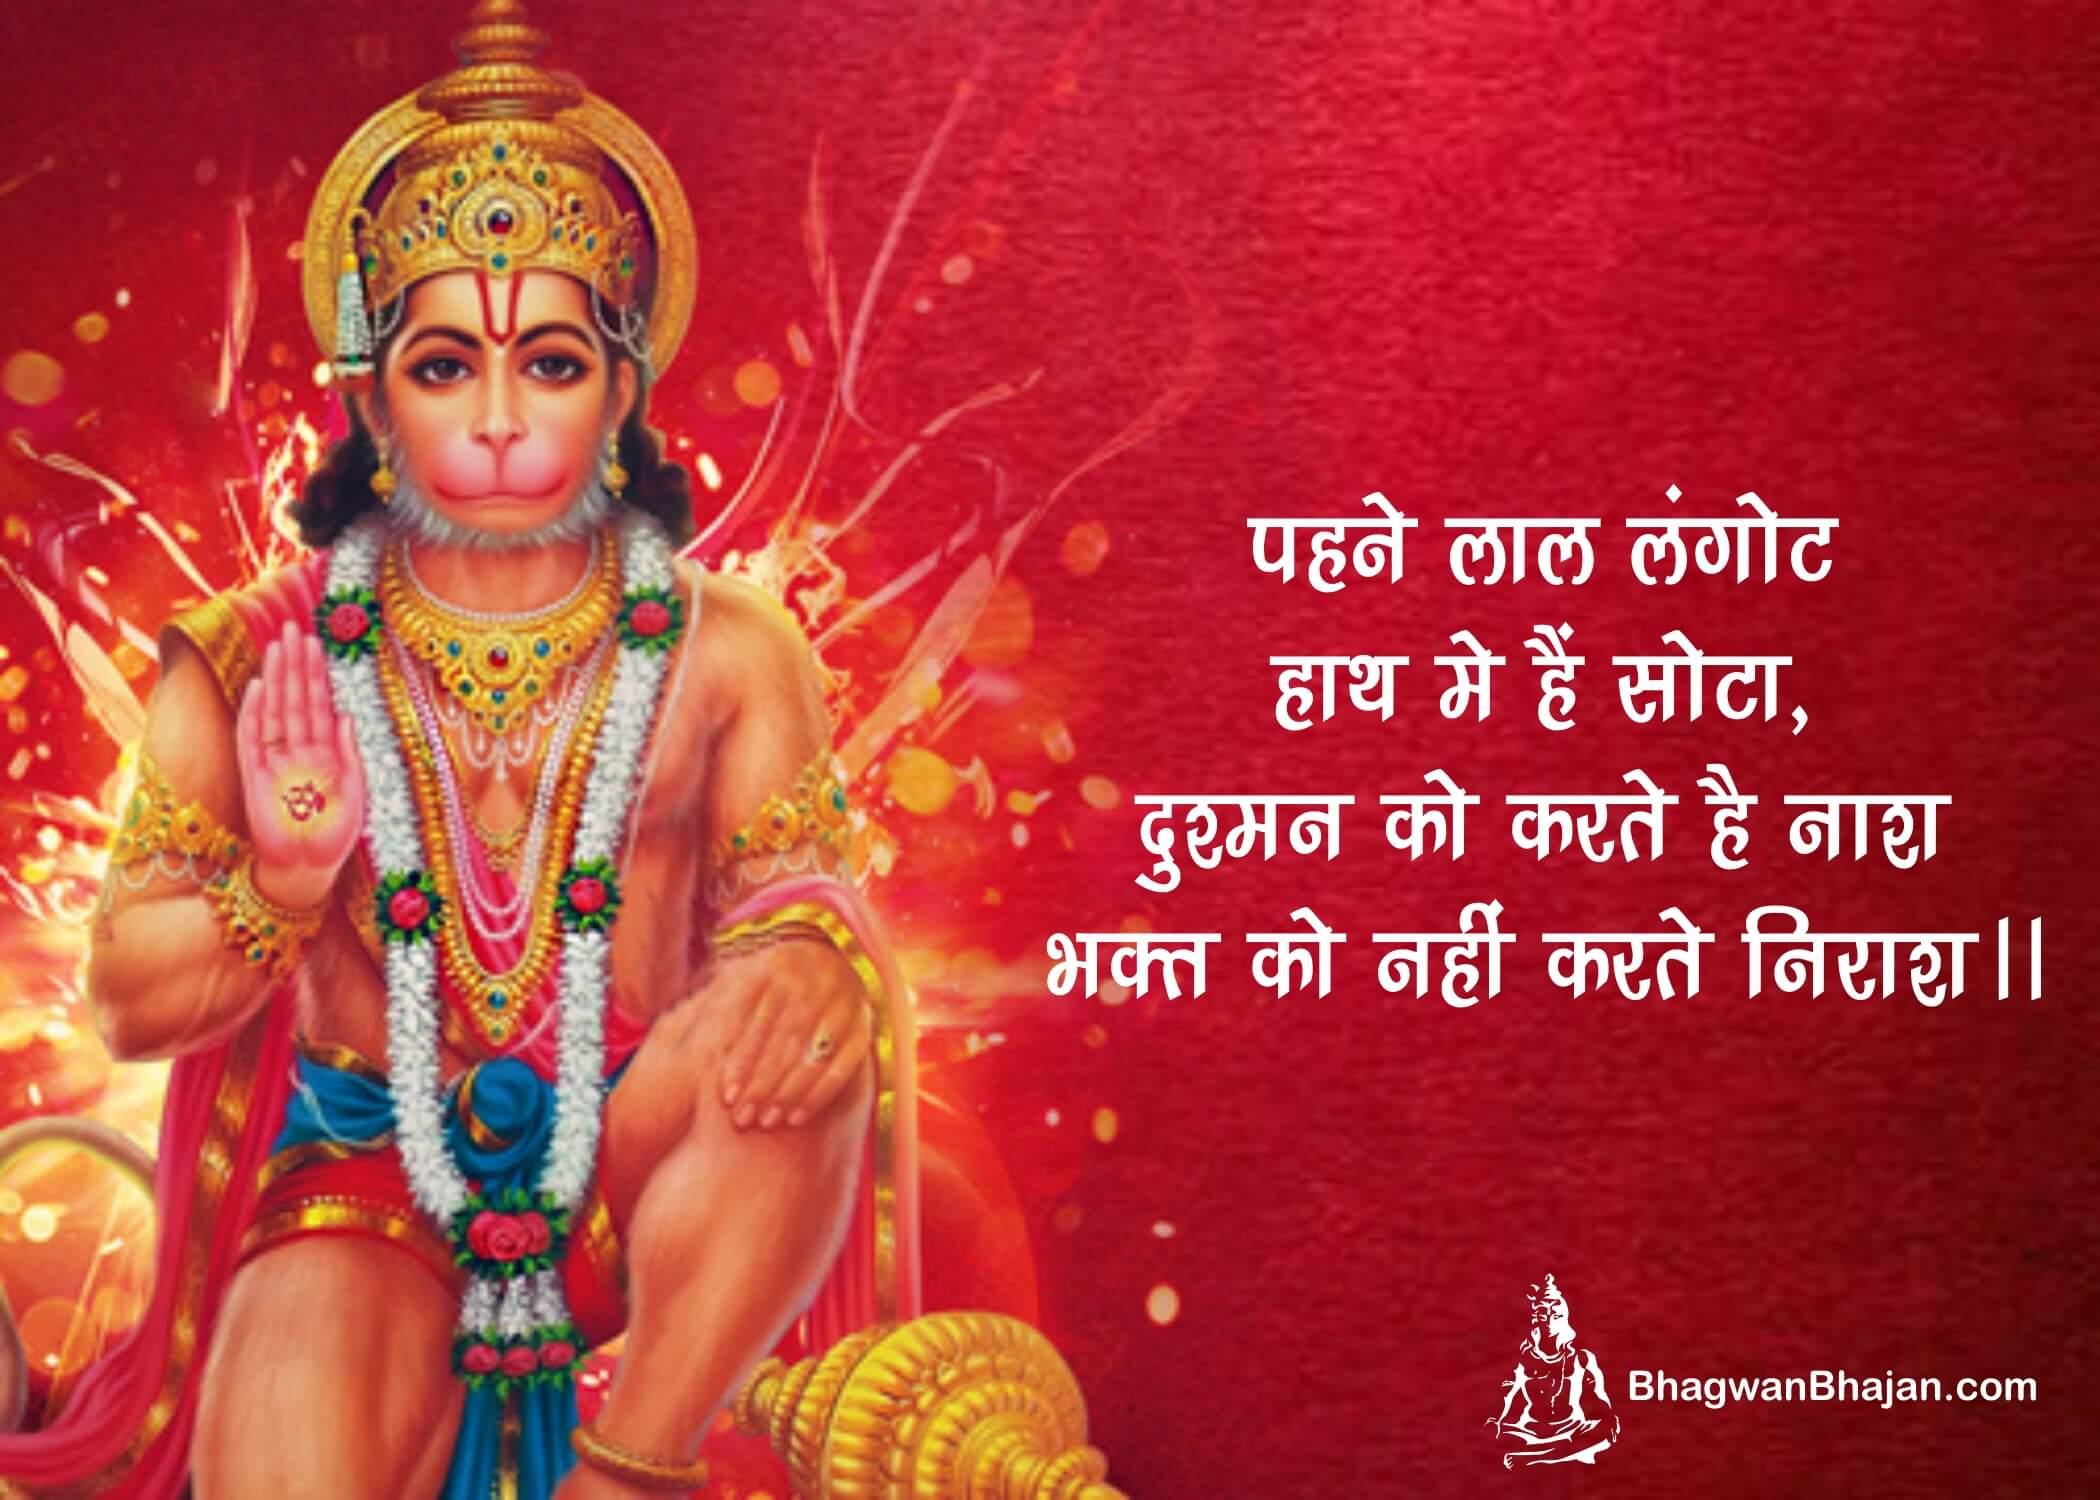 Hanuman Ji Hd Whatsapp Status Image